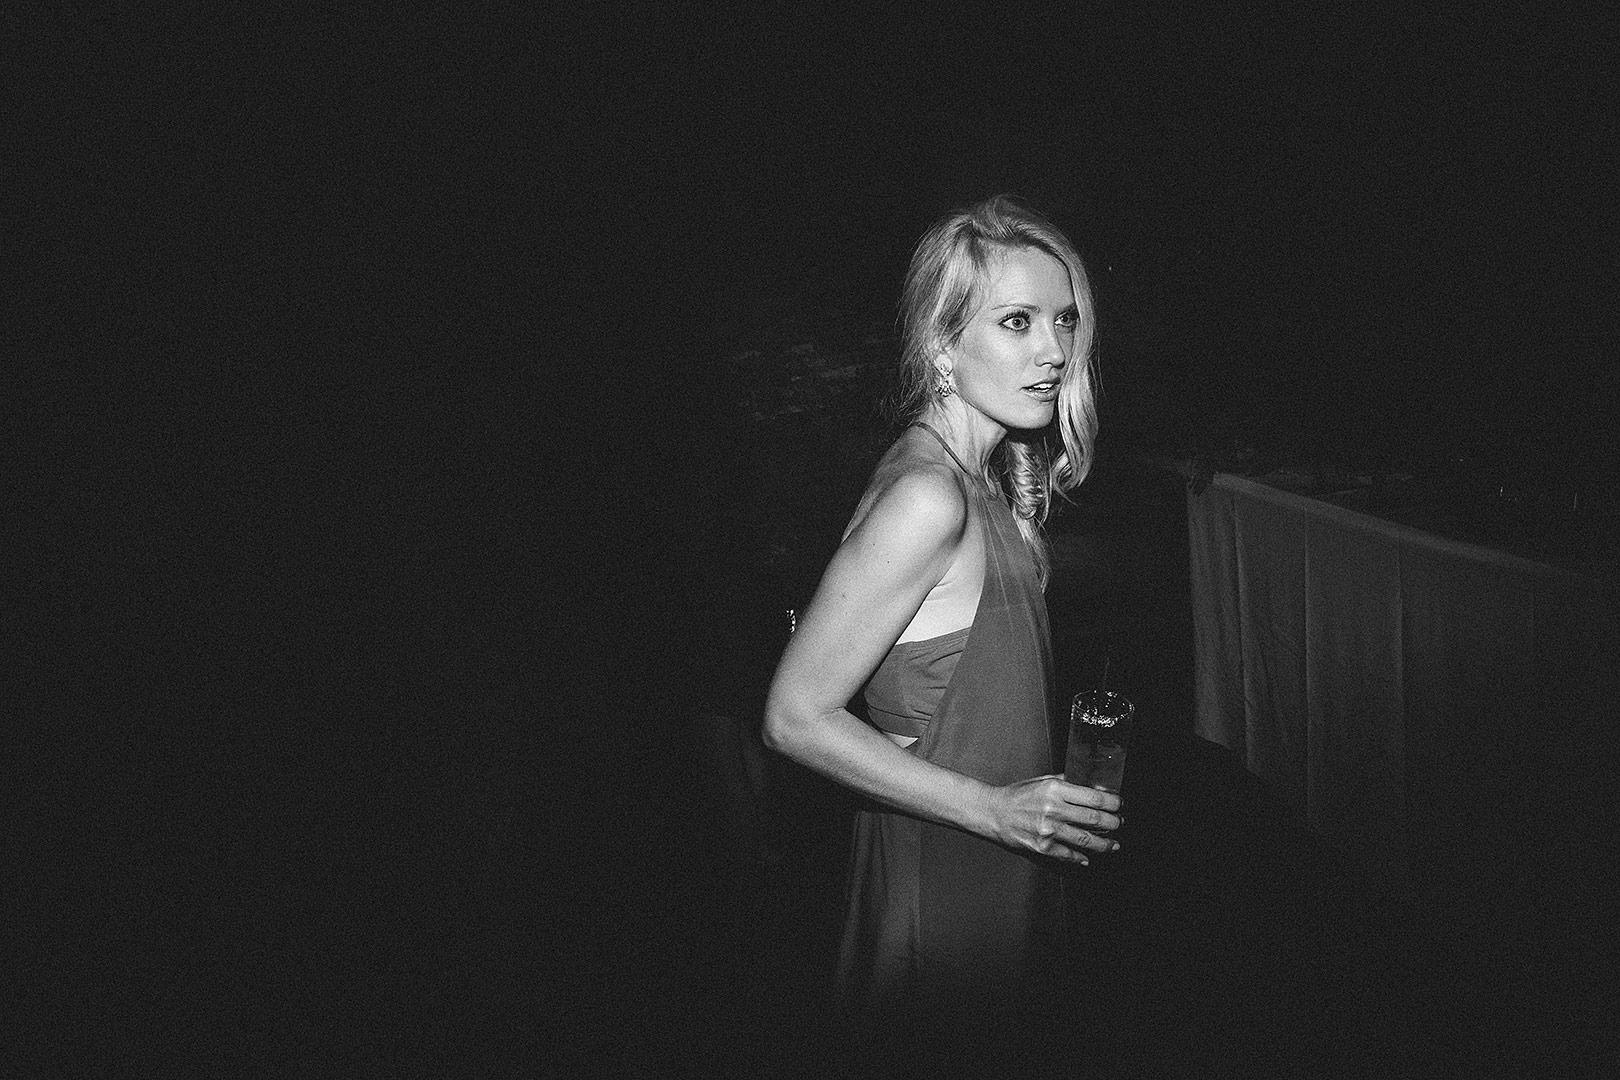 wedding-date-07